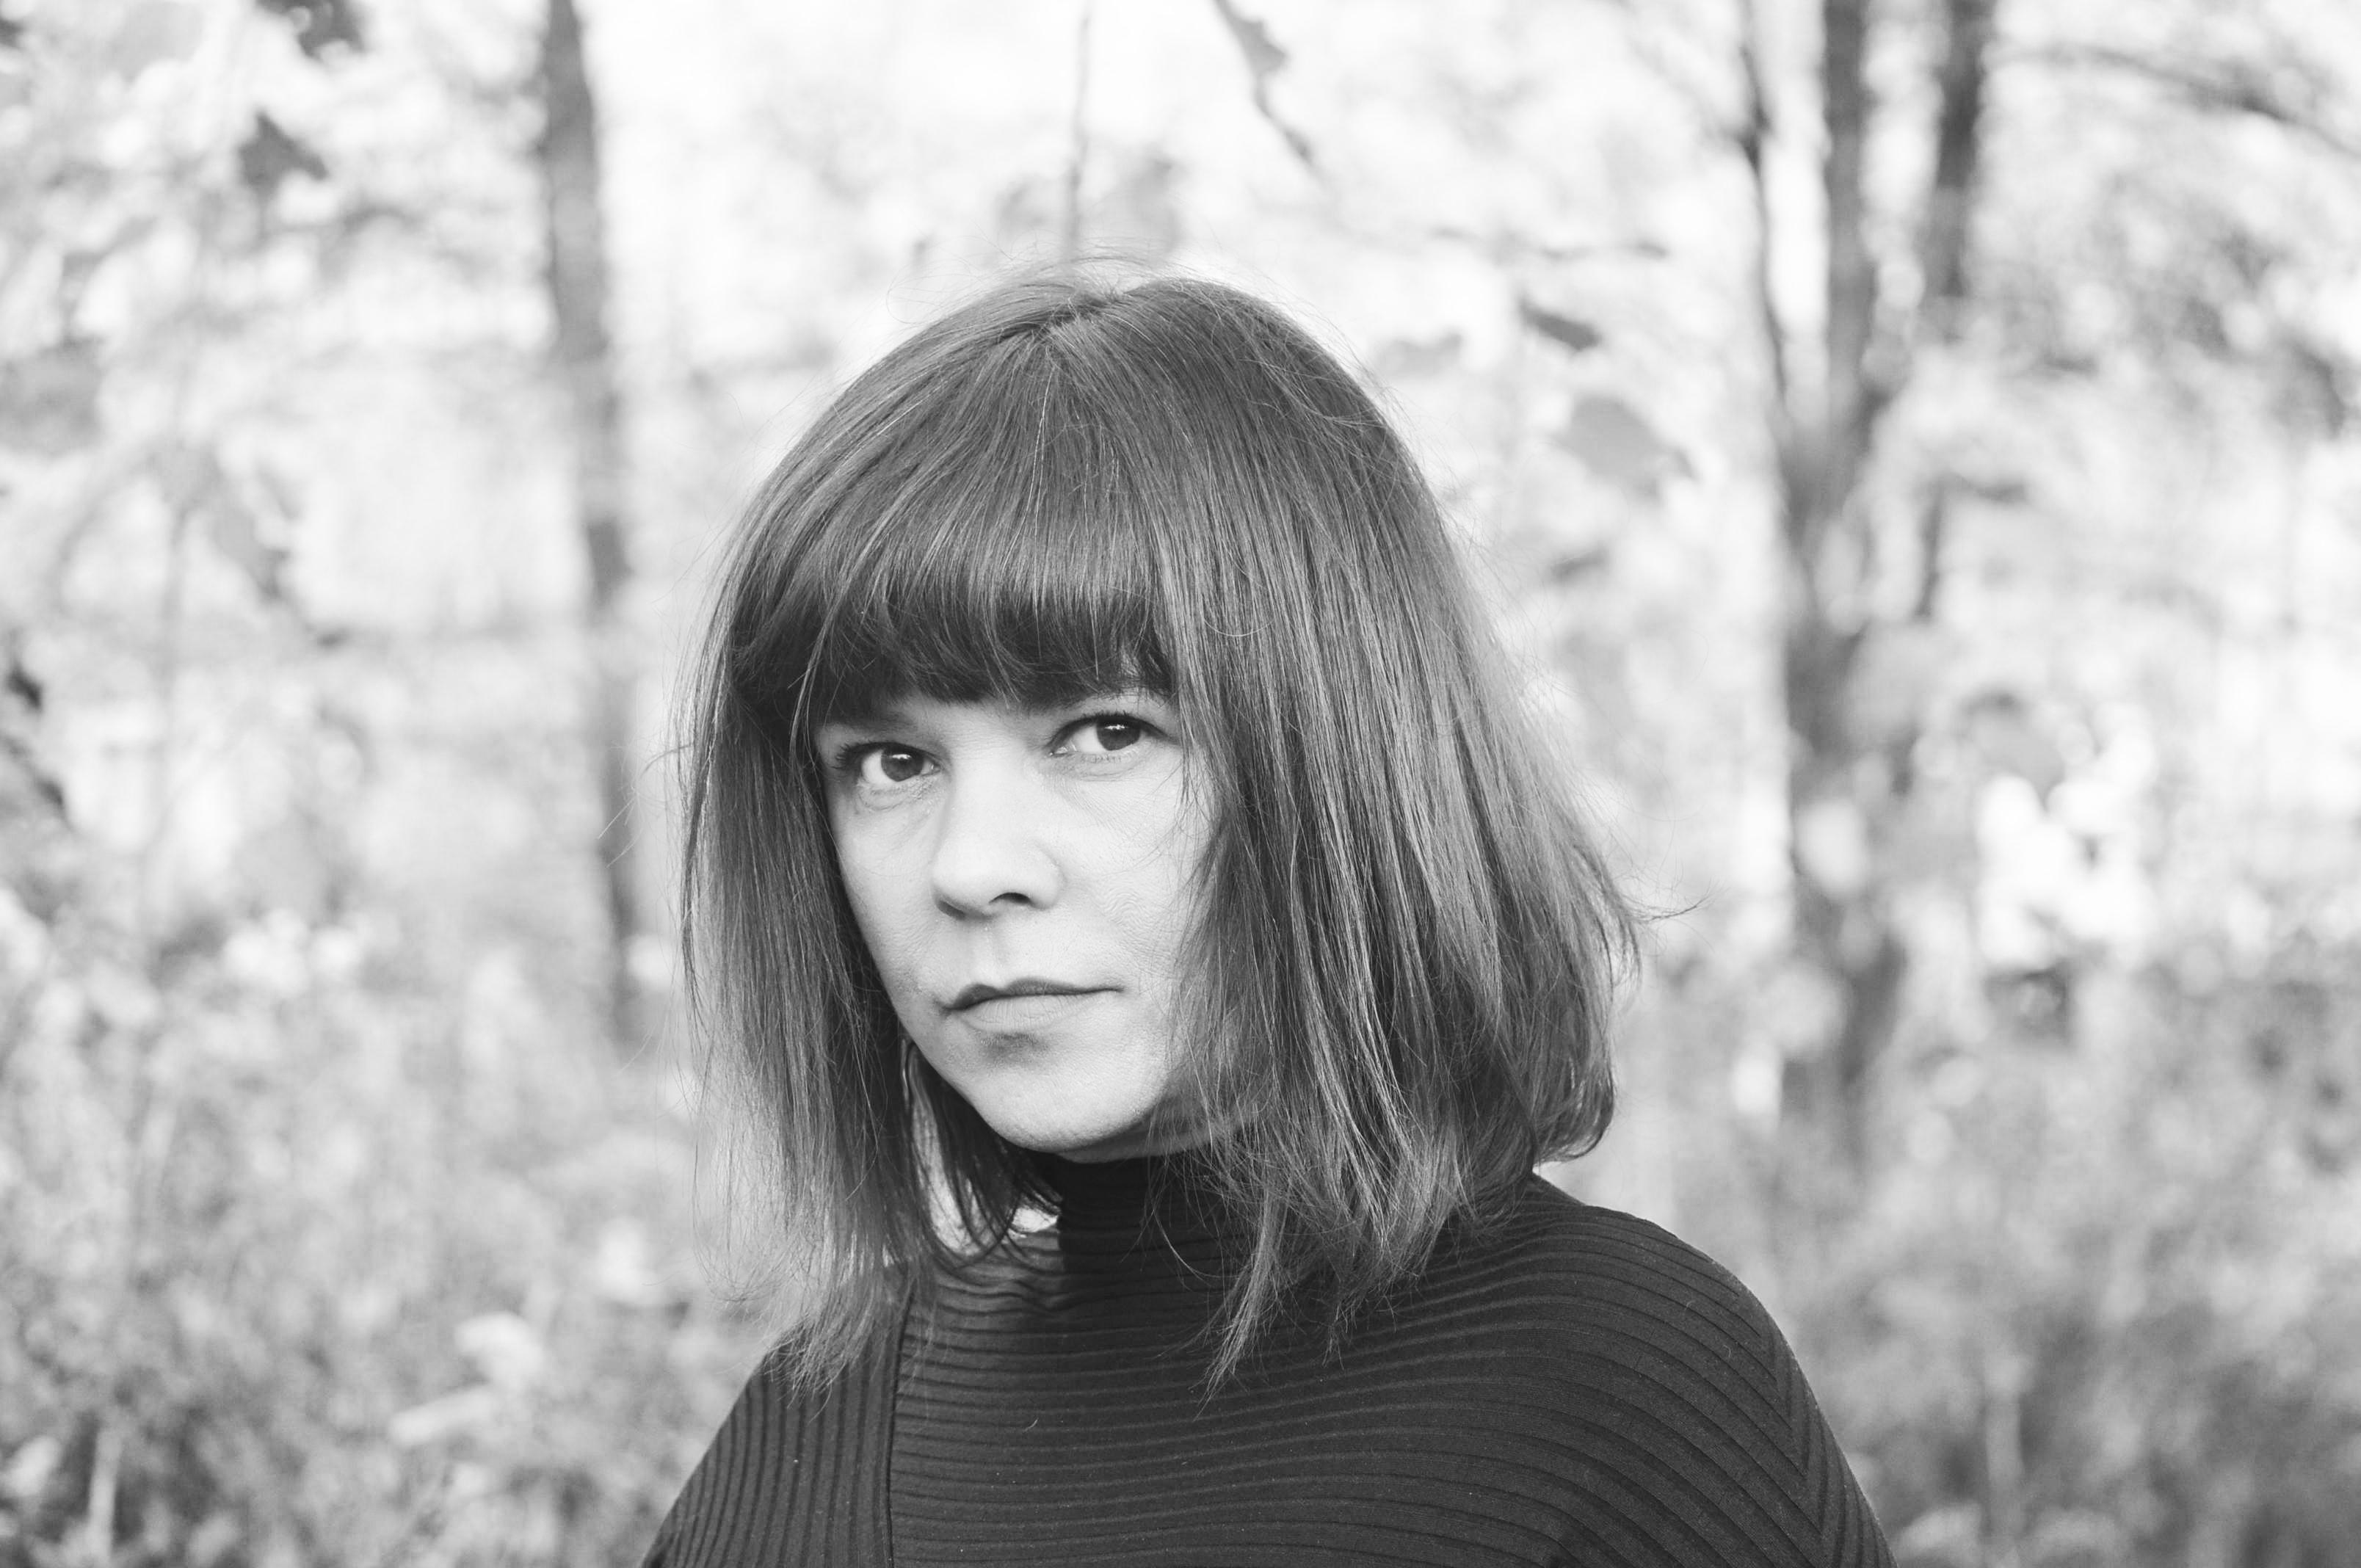 Beata Twardowska